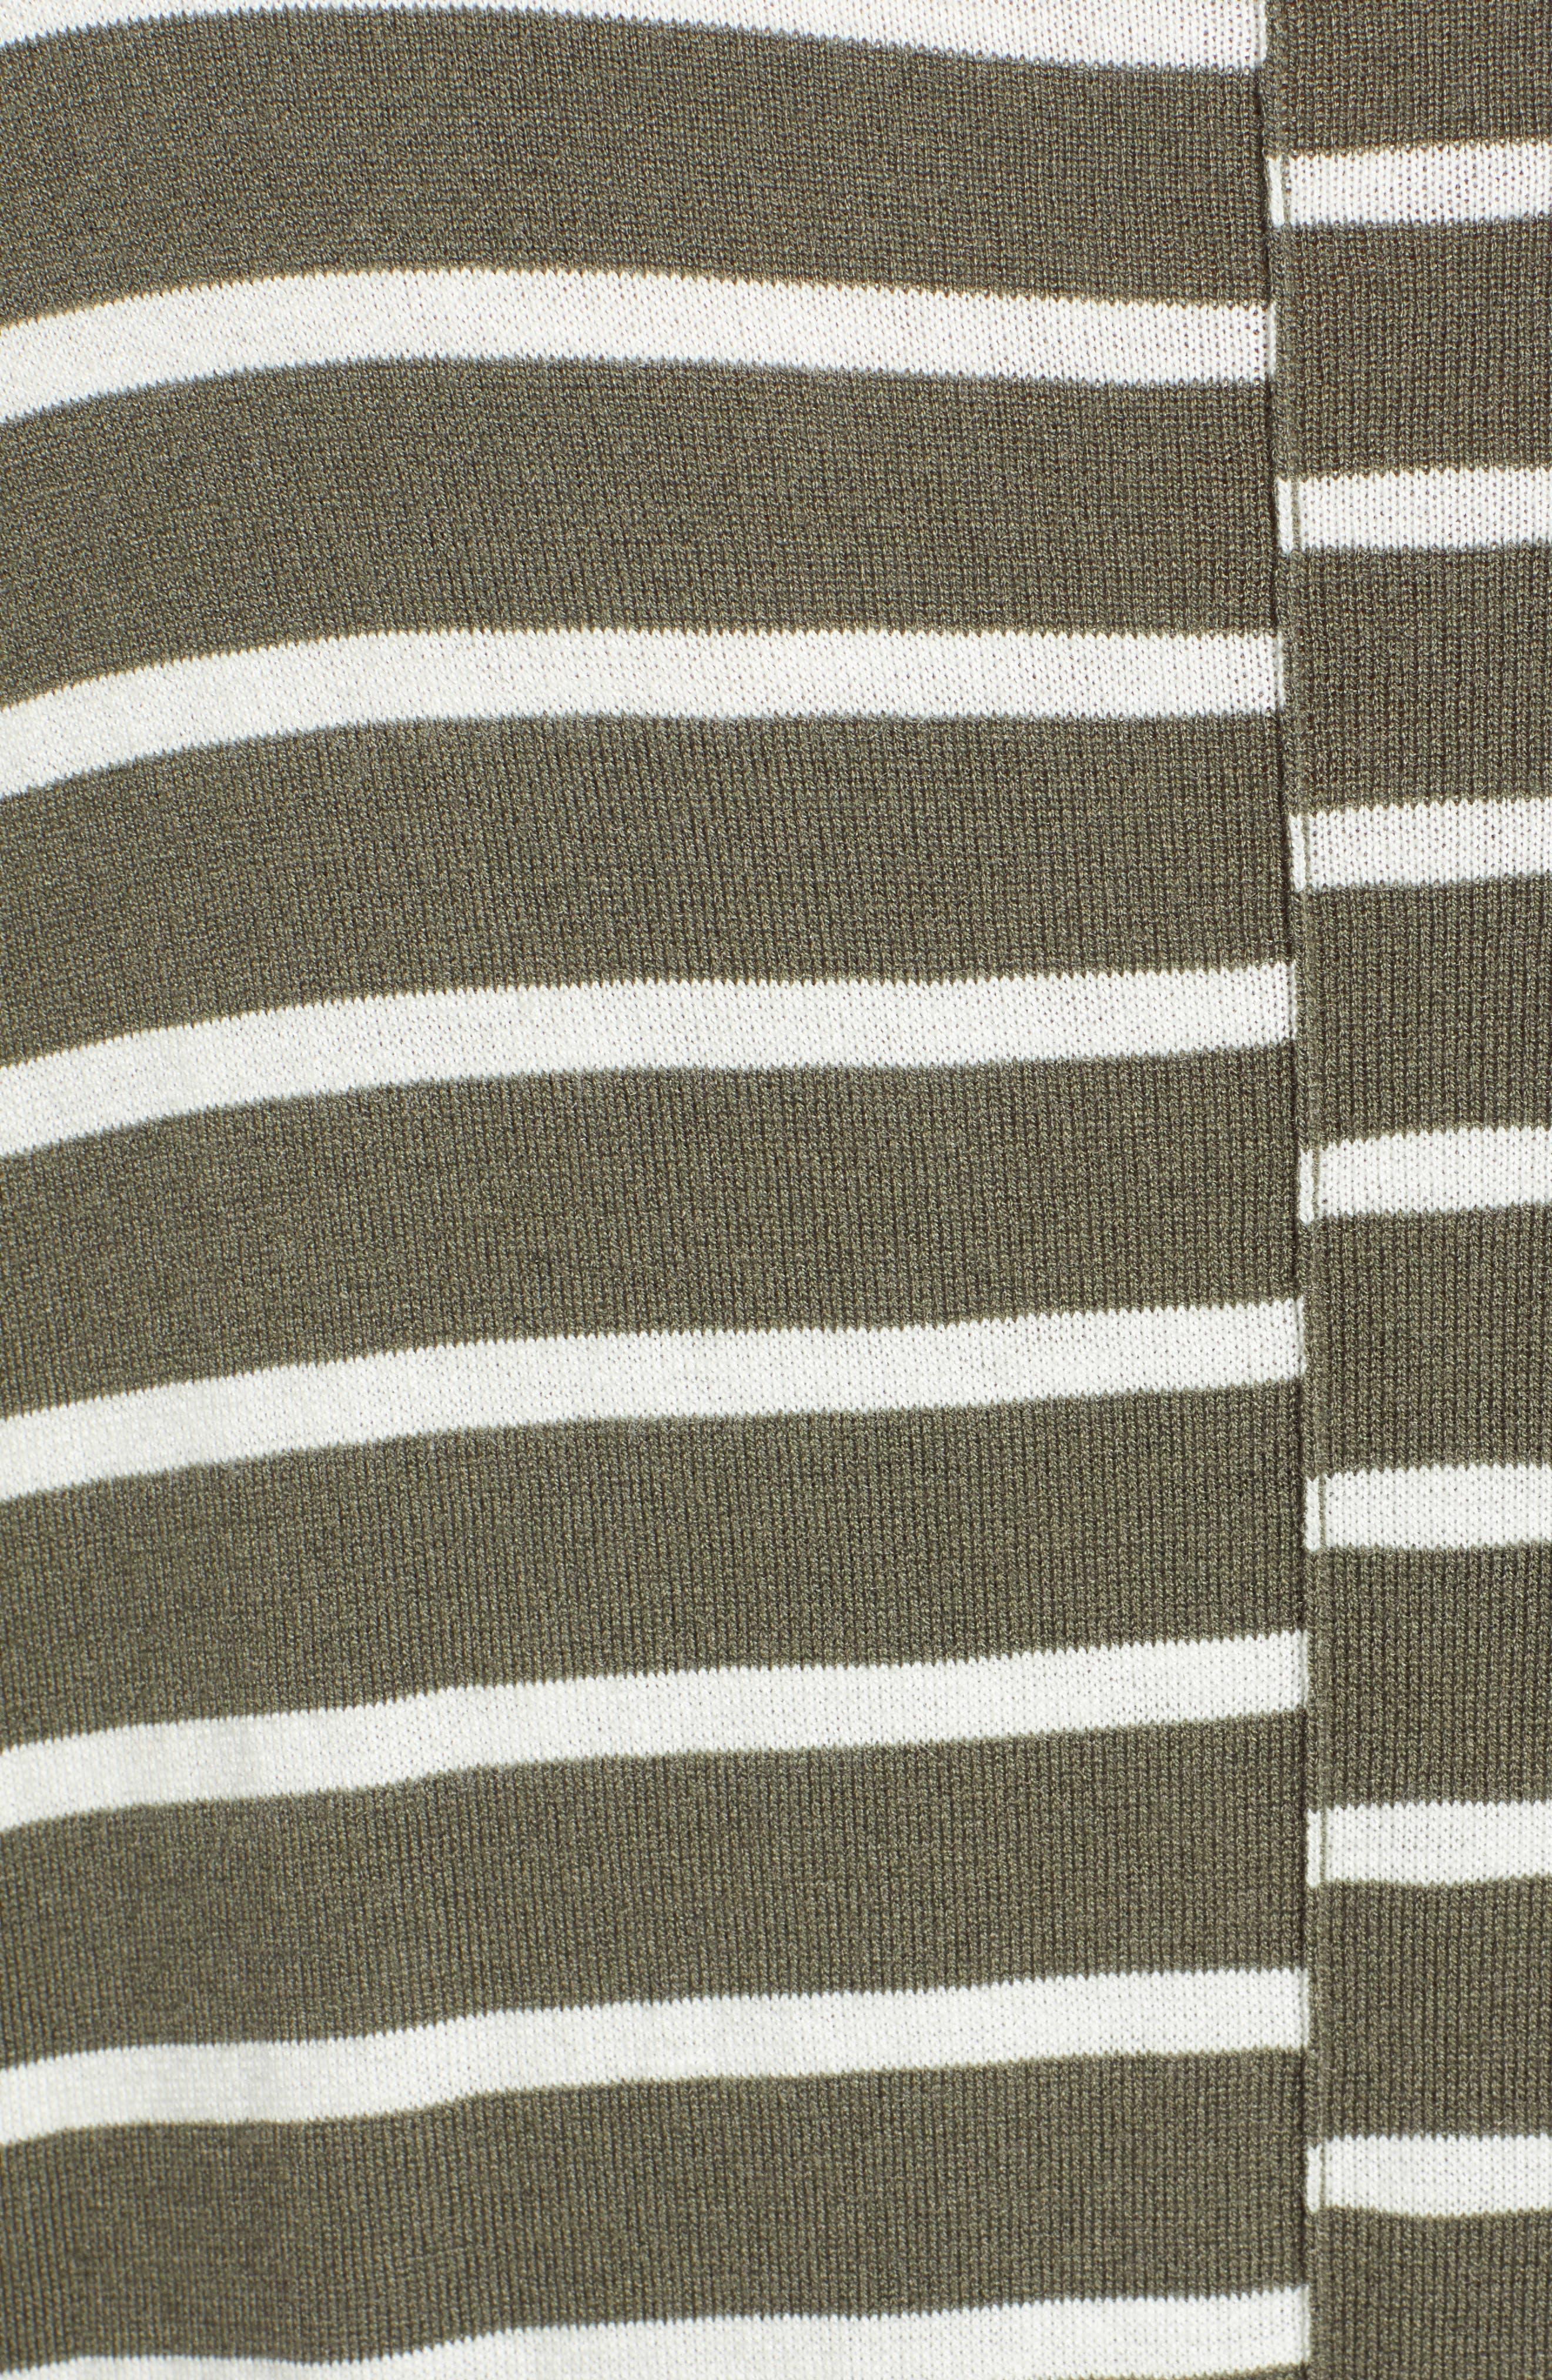 High-Low V-neck Sweater,                             Alternate thumbnail 5, color,                             GREEN- IVORY PRITHI STRIPE